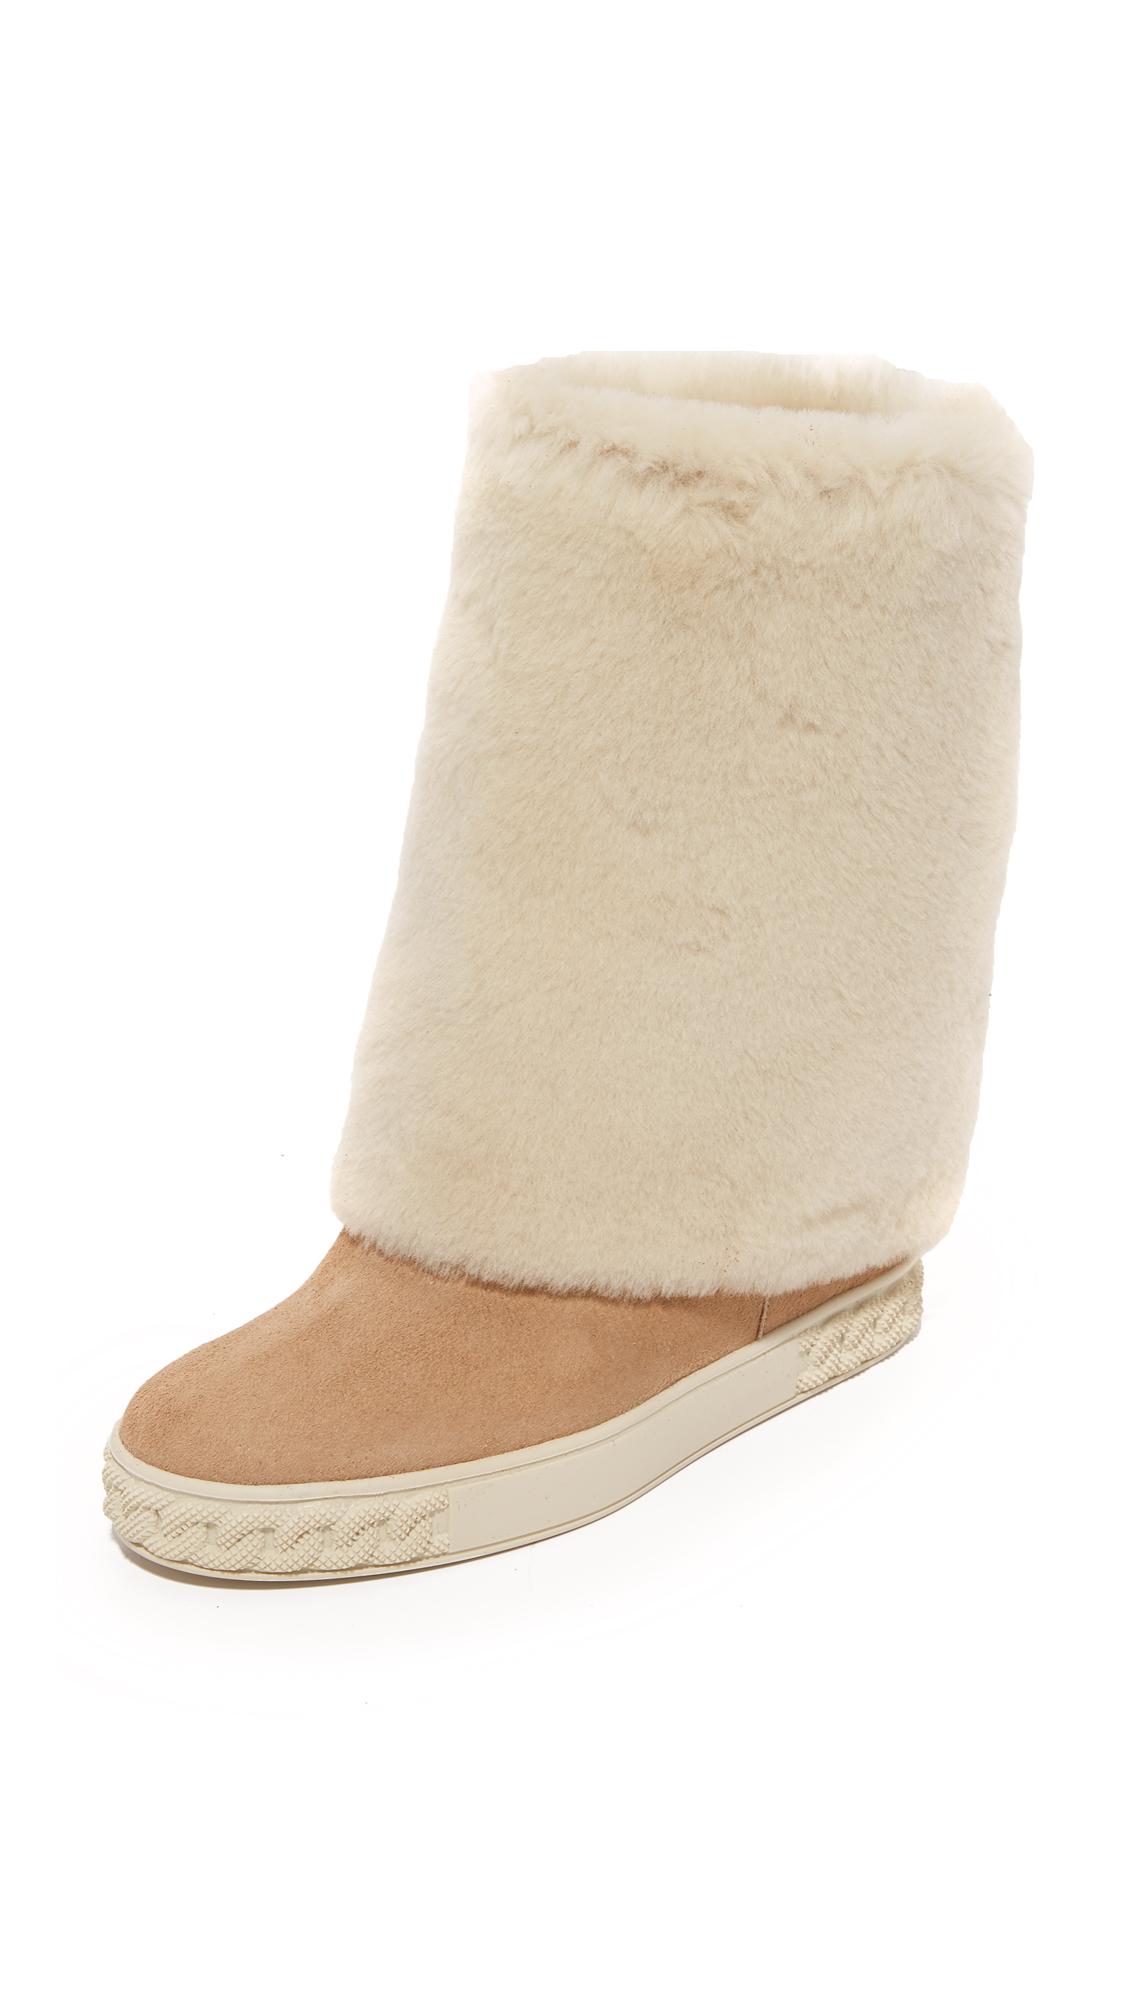 Casadei Suede Boots - Oasis